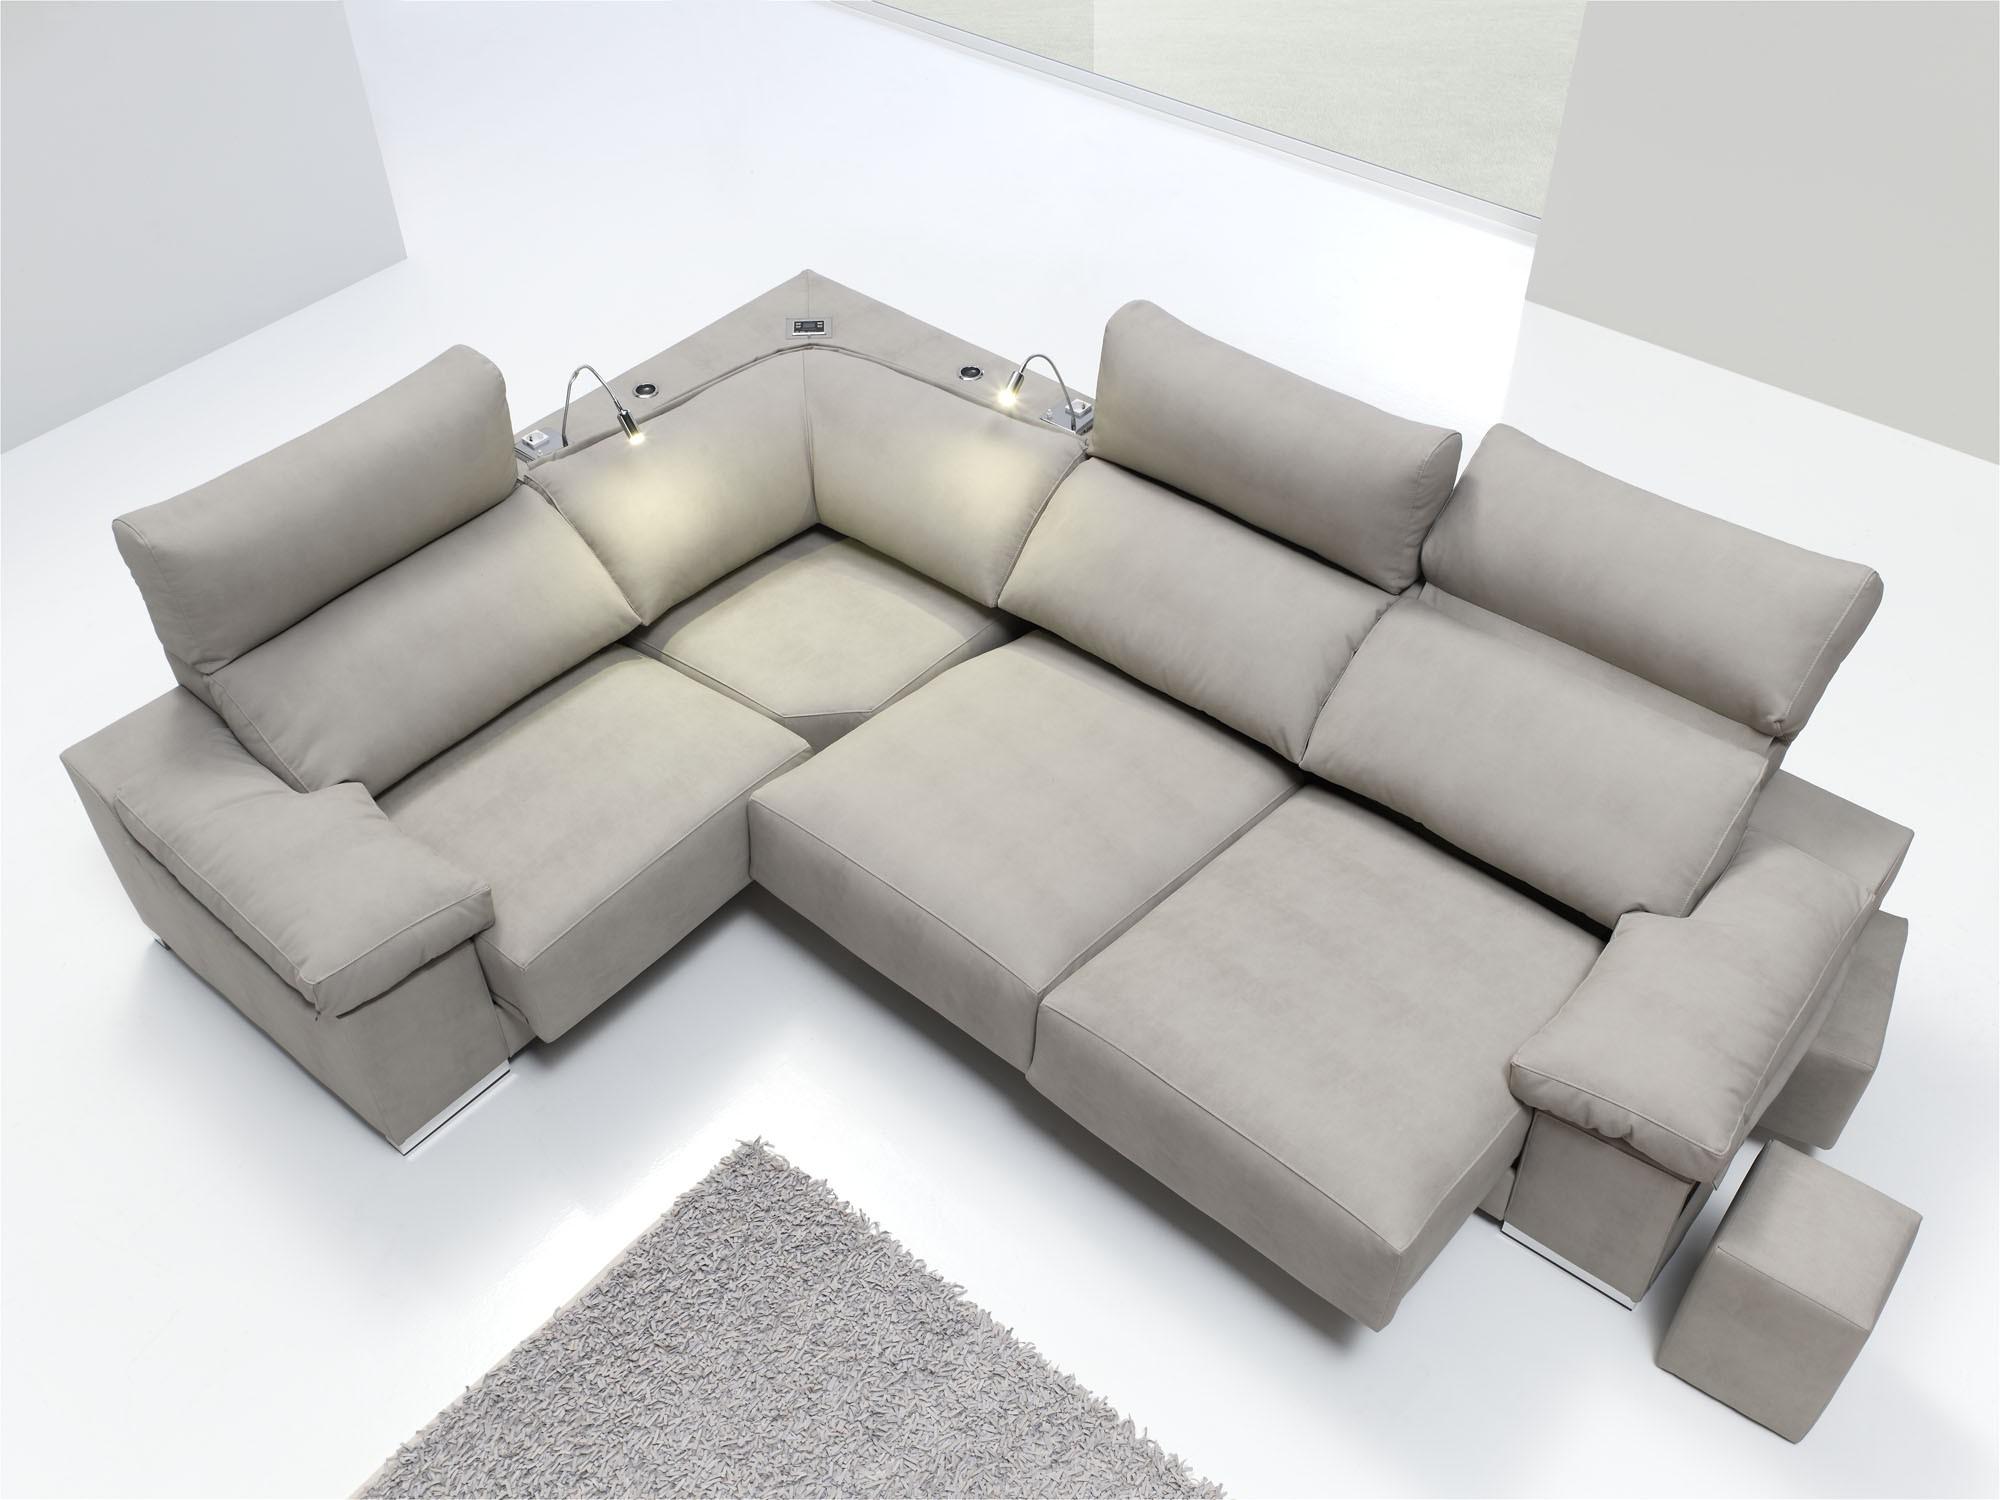 Sof rinconera galaxy muebles la ilusi n - Sofa rinconera moderno ...